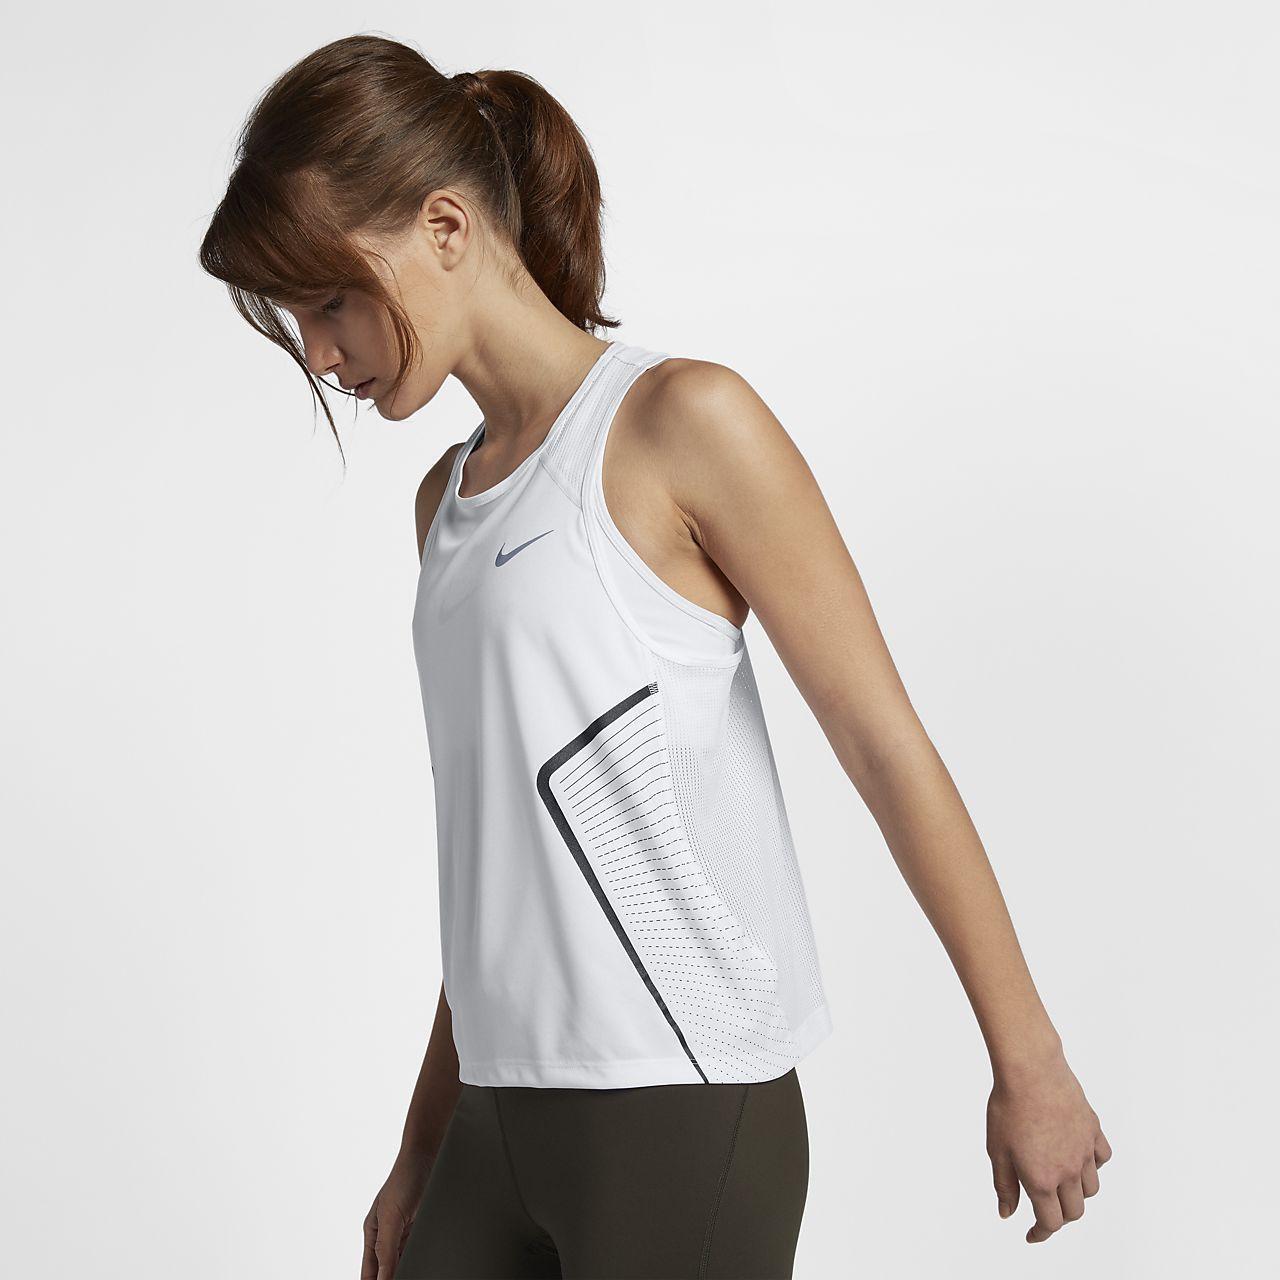 011e09bd10f29 Nike Dri-FIT Miler Women s Running Tank Top